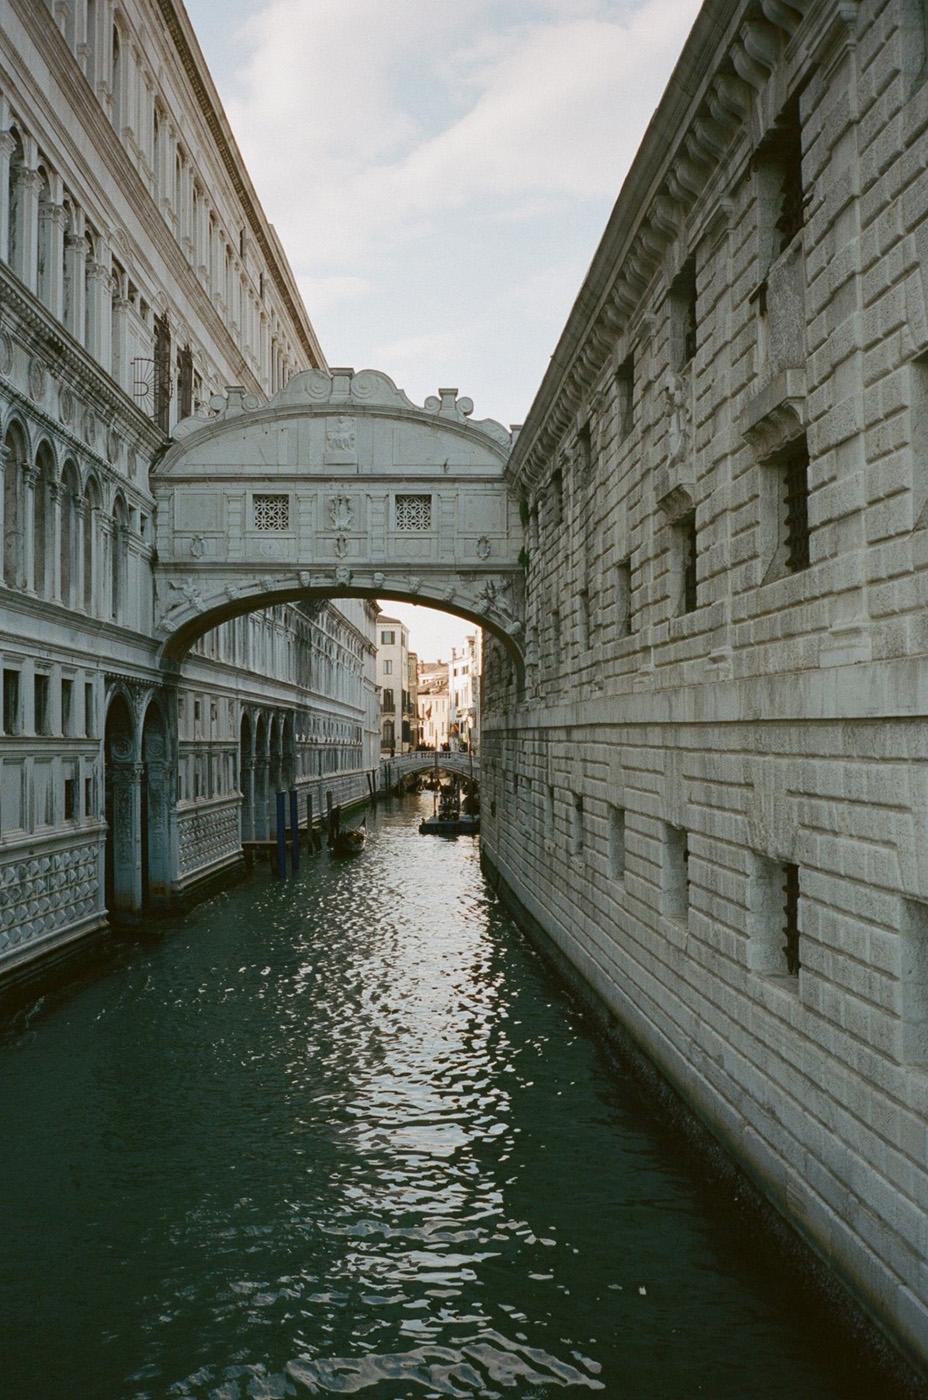 Deborah_Farnault_Venice_Biennale_Italy_2019_00020024.jpg